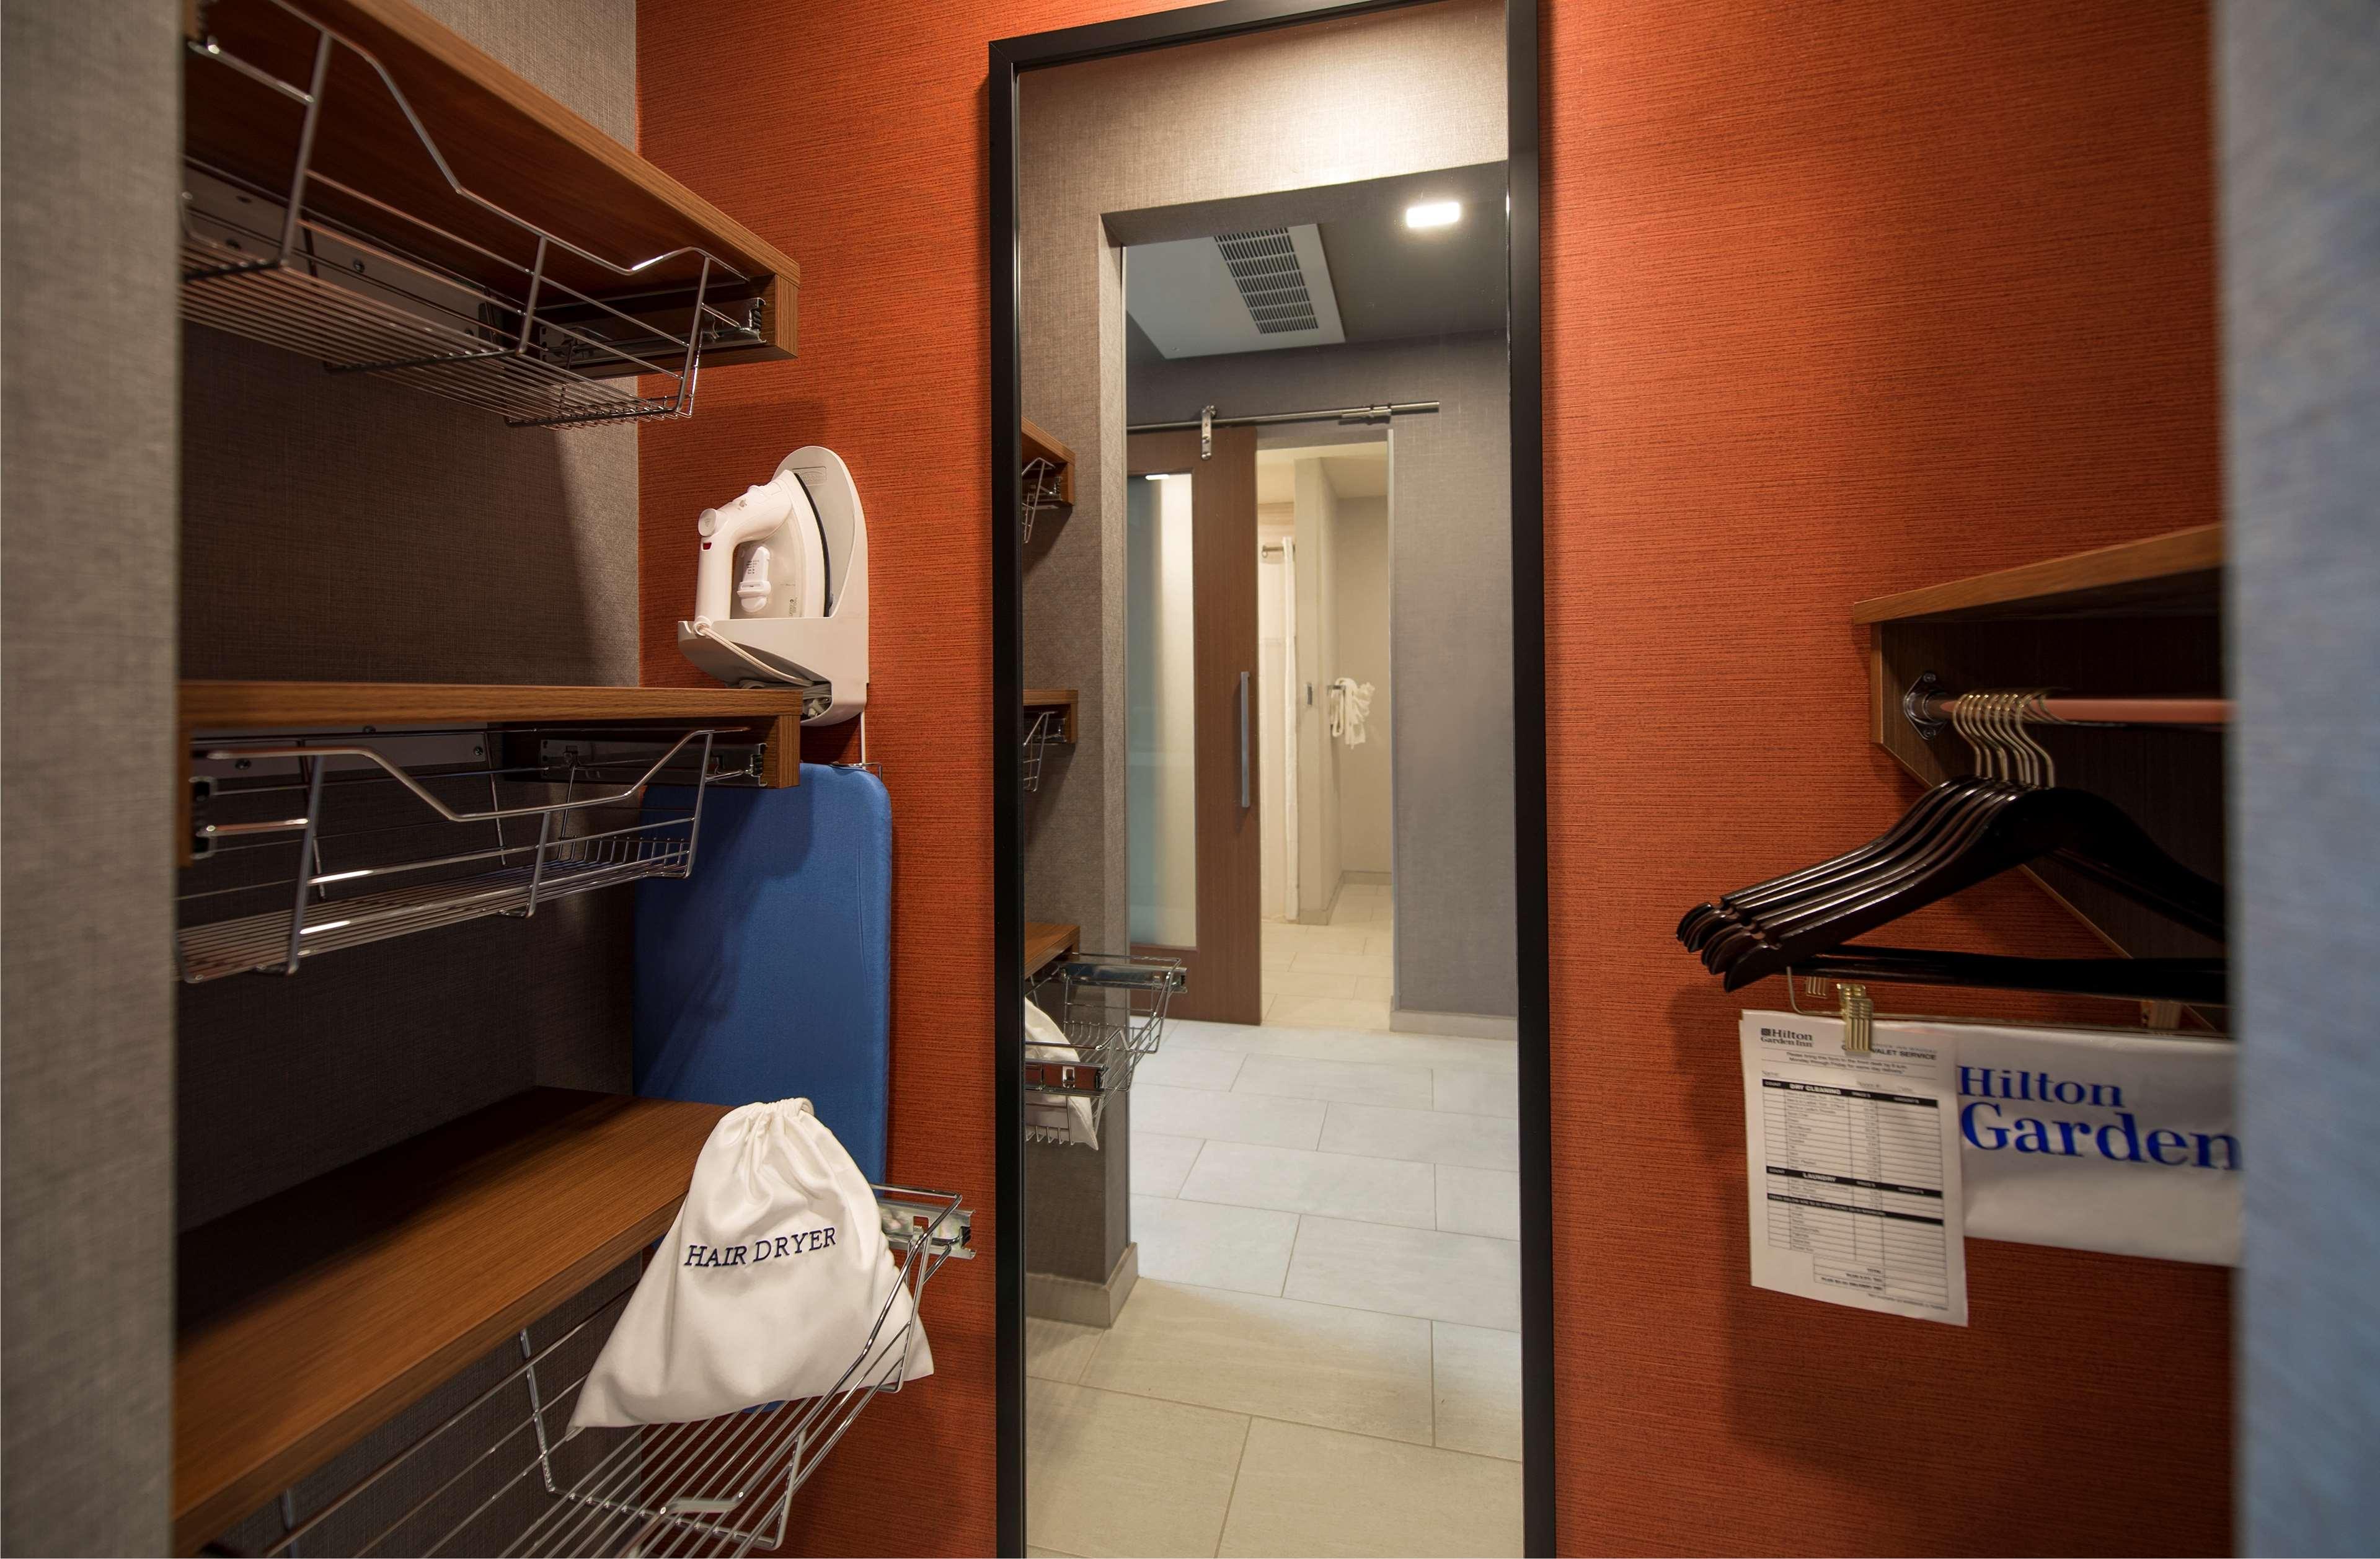 Hilton Garden Inn Wausau image 23